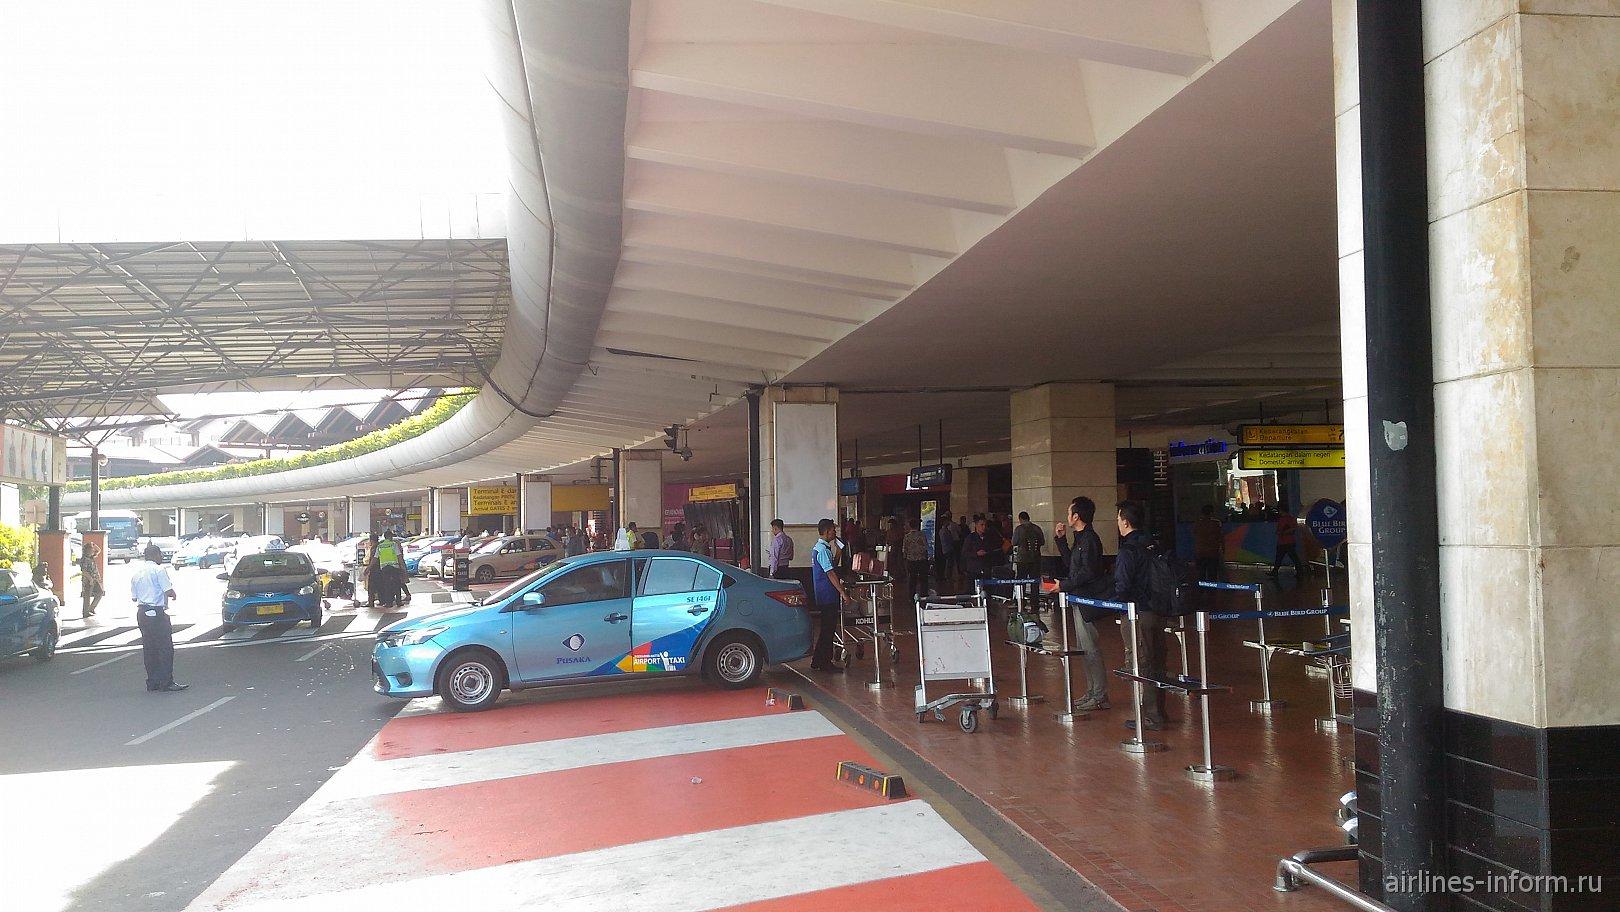 Стоянки такси в зоне прилета аэропорта Джакарта Сукарно-Хатта